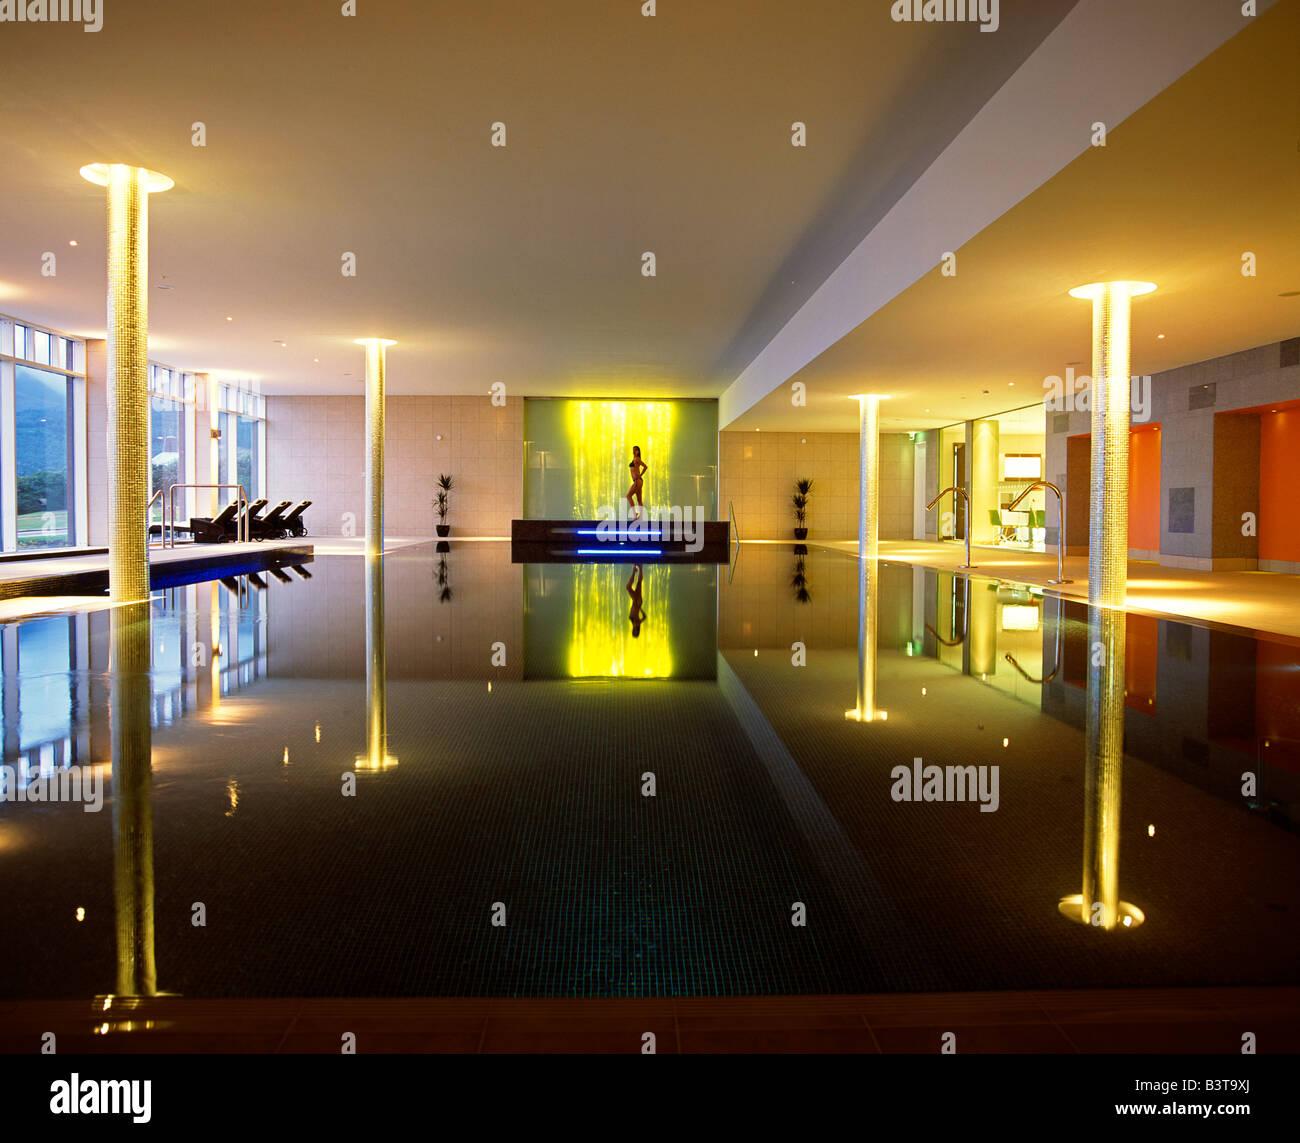 Slieve Donard Hotel Stock Photos Slieve Donard Hotel Stock Images Alamy